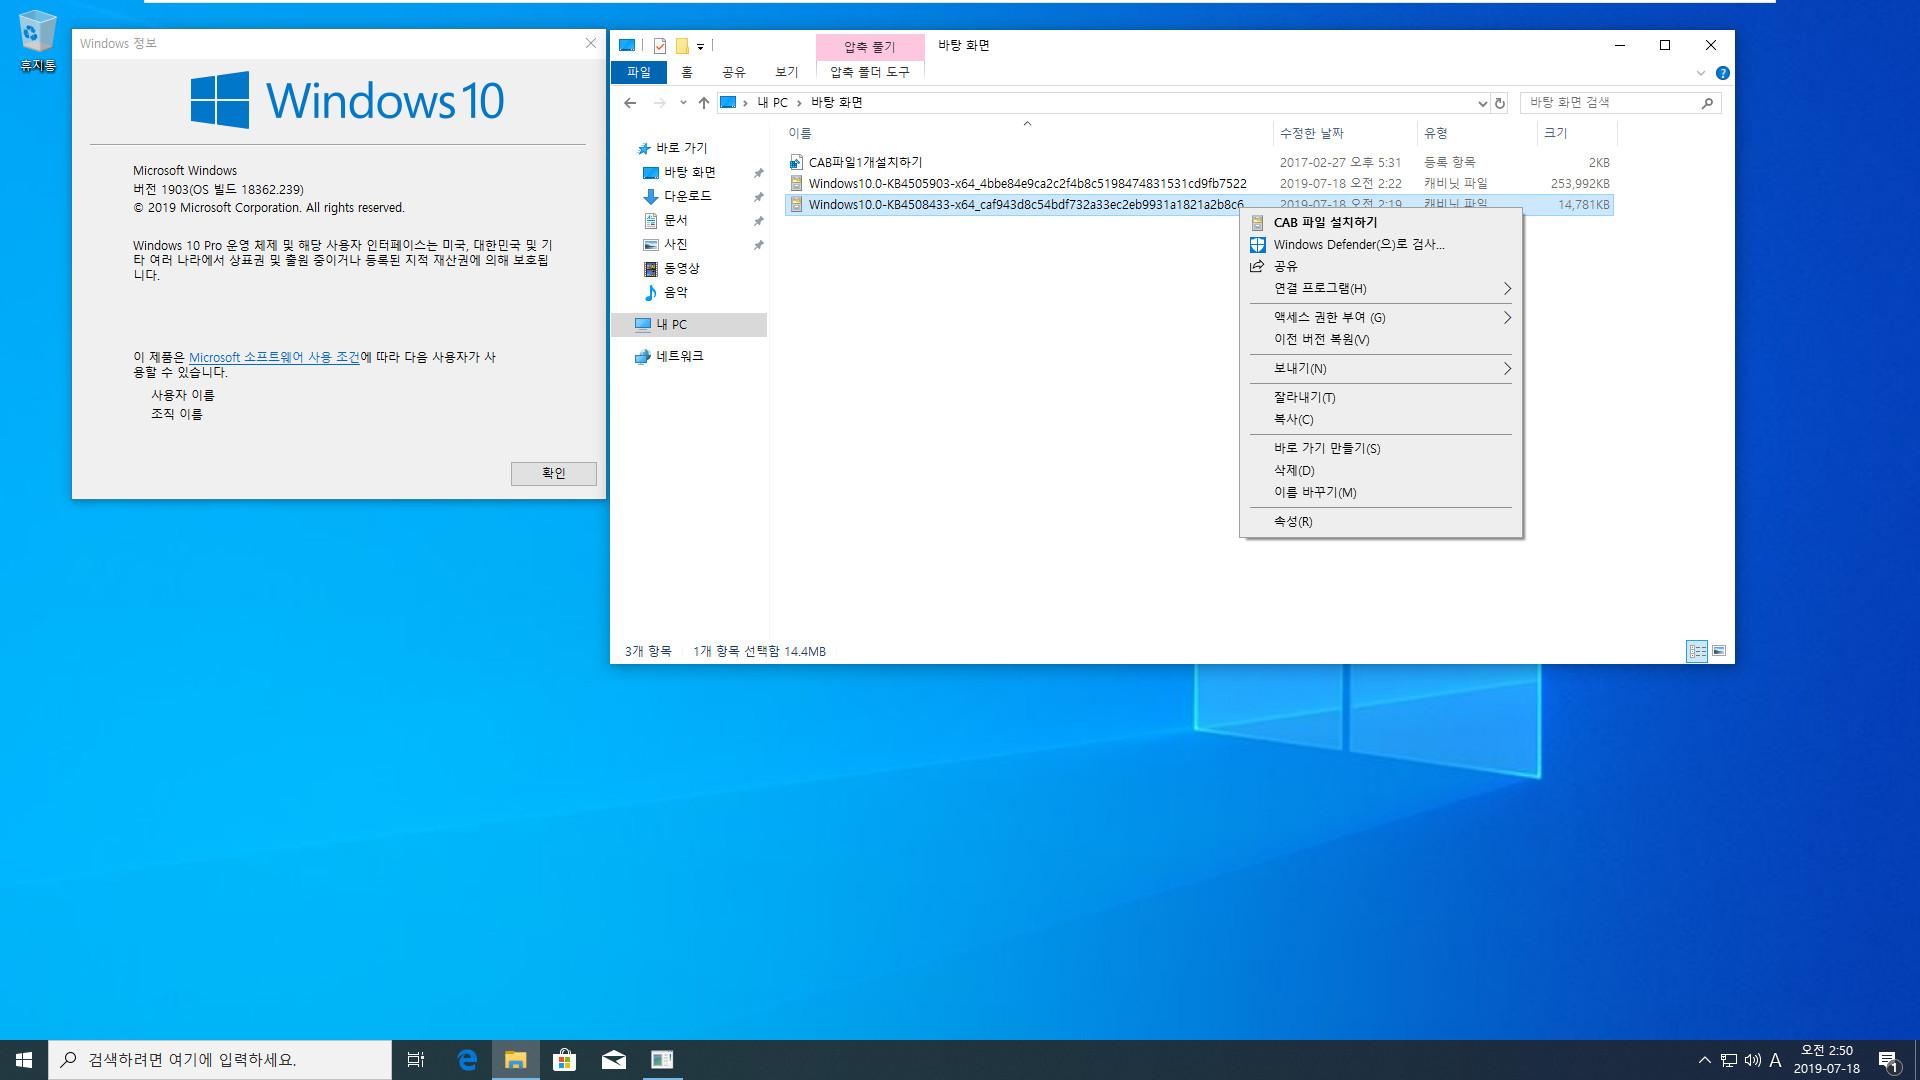 Windows 10 버전 1903 누적 업데이트 KB4505903 (OS 빌드 18362.263) [2019-07-17 일자] 나왔네요 - 64비트만 공개됨 - 2019-07-18_025048.jpg